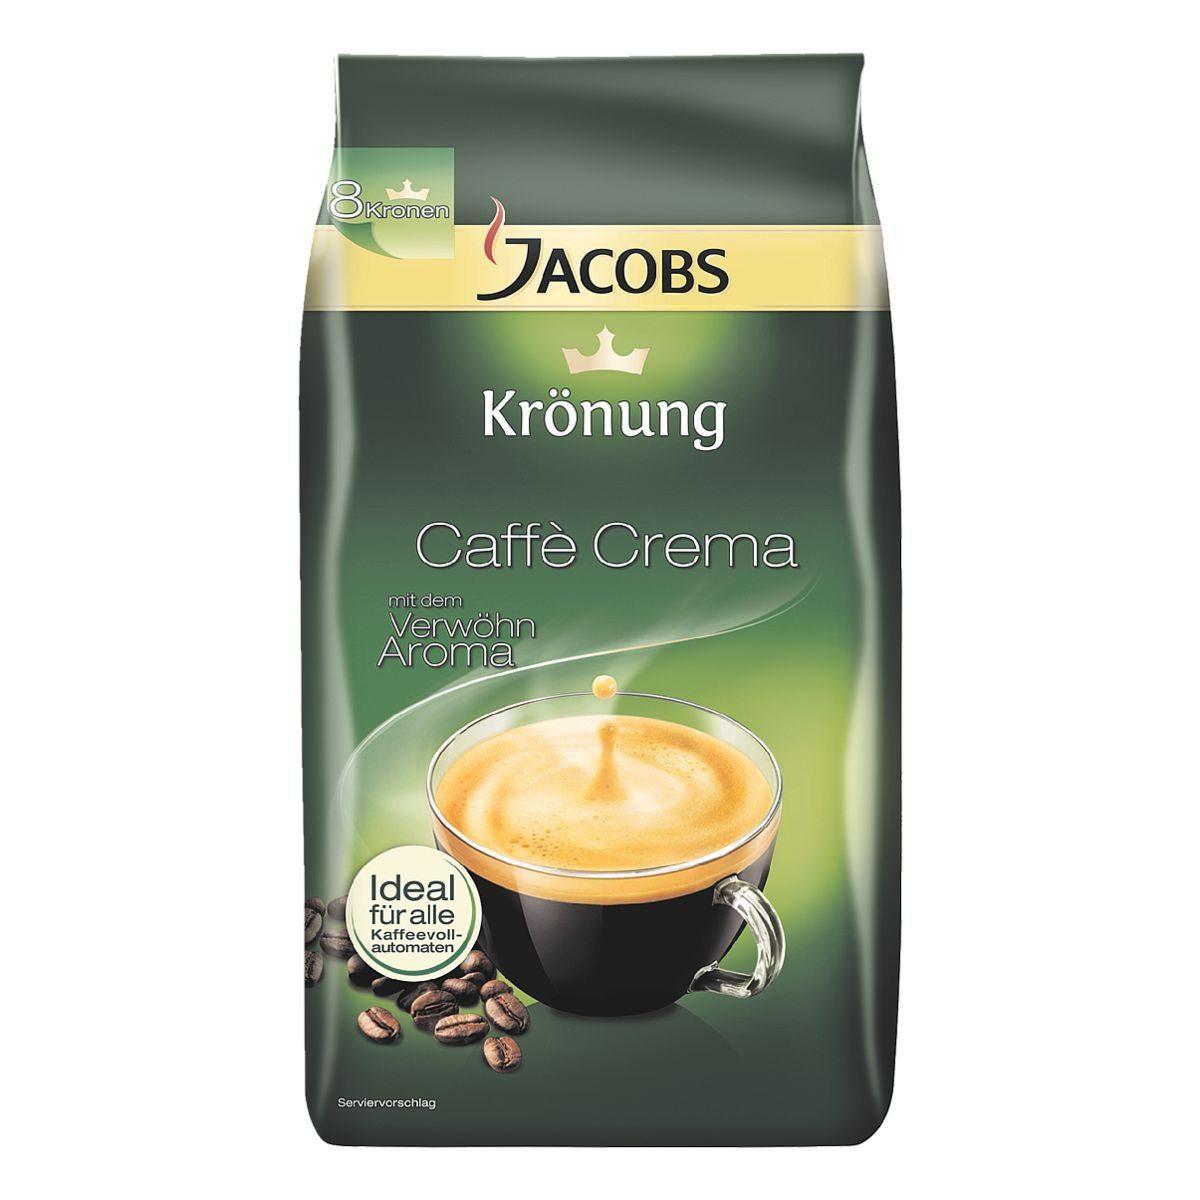 Jacobs Kaffee - ganze Bohnen »Krönung Caffè Crema«